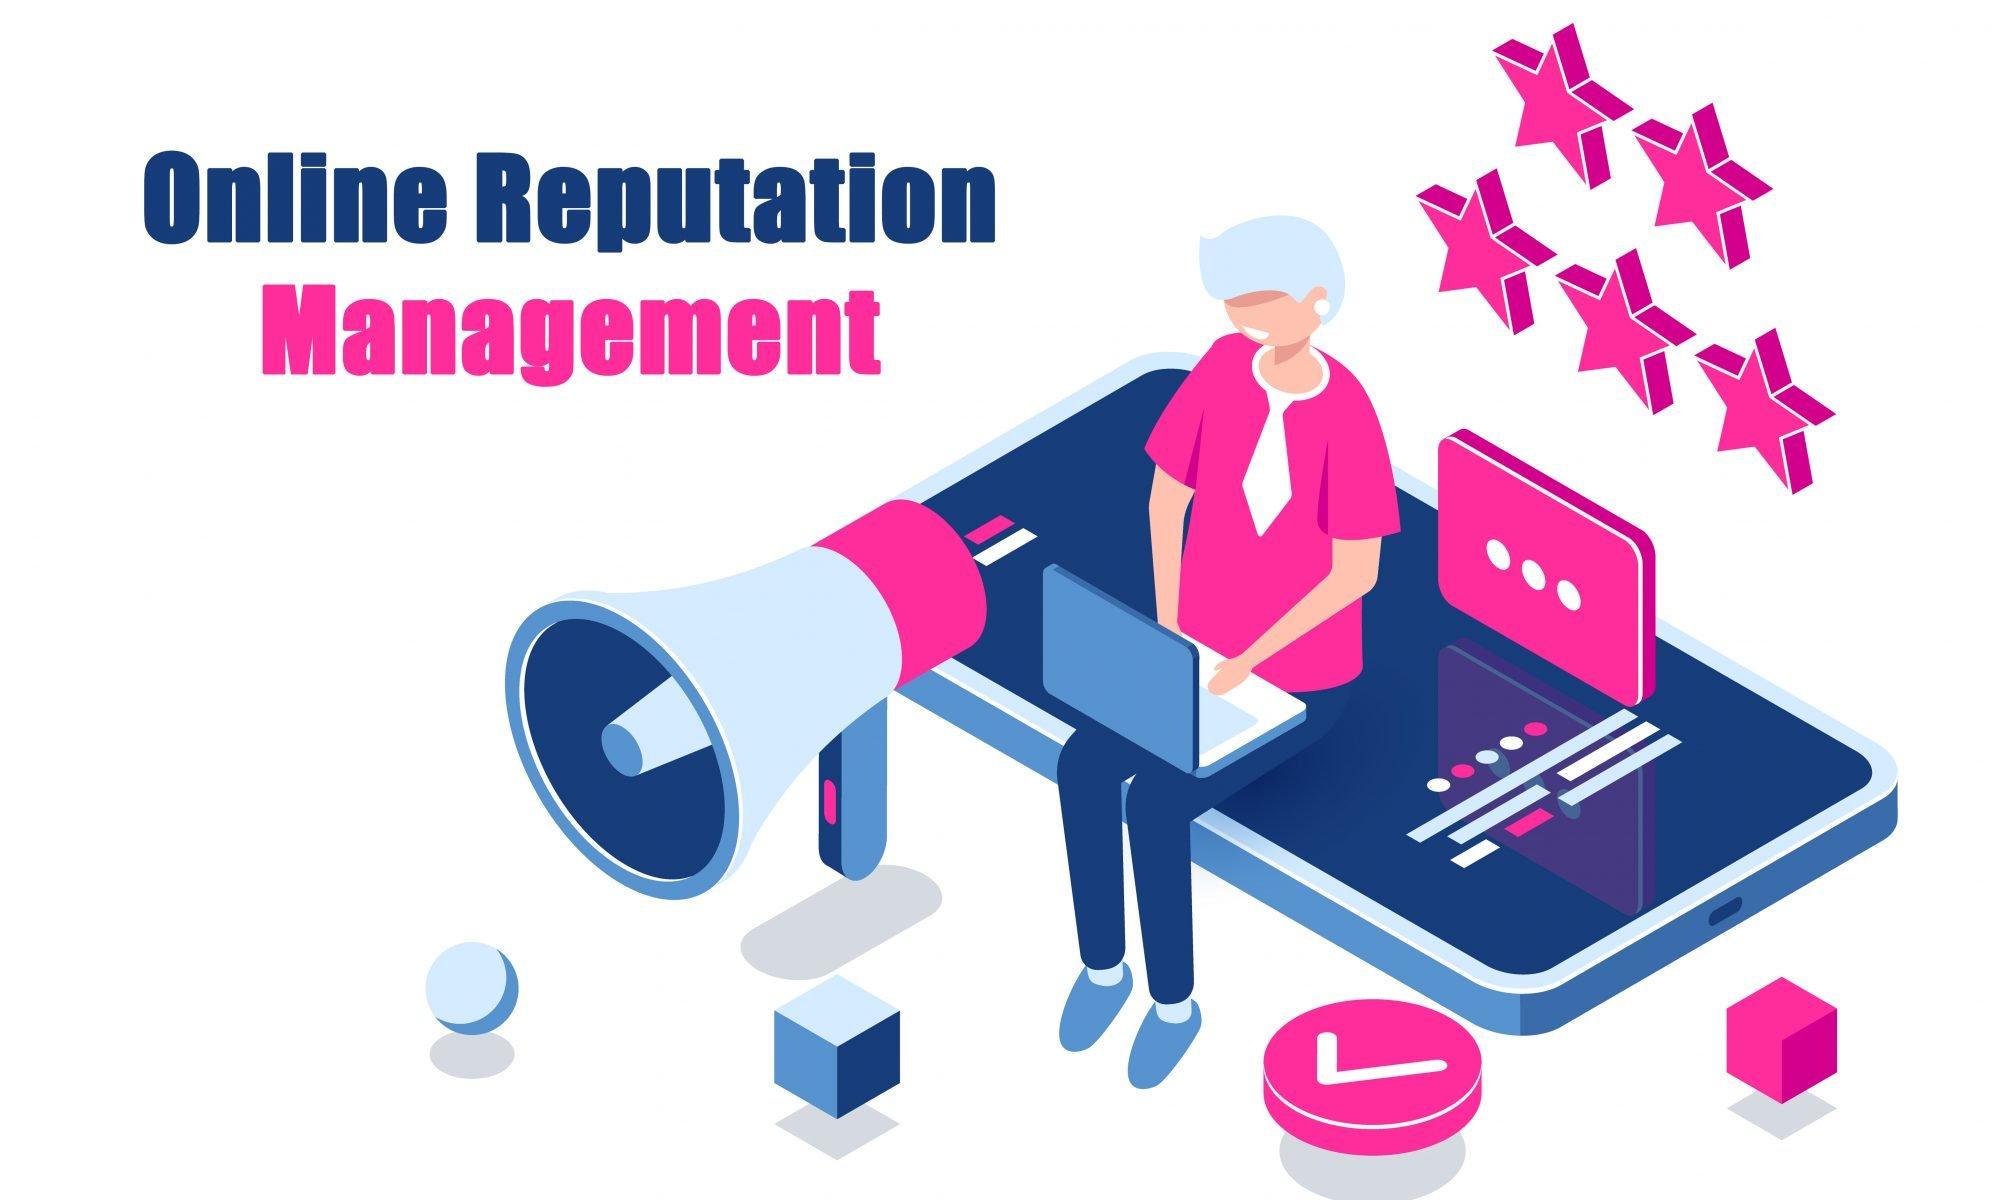 Online reputation management Australia